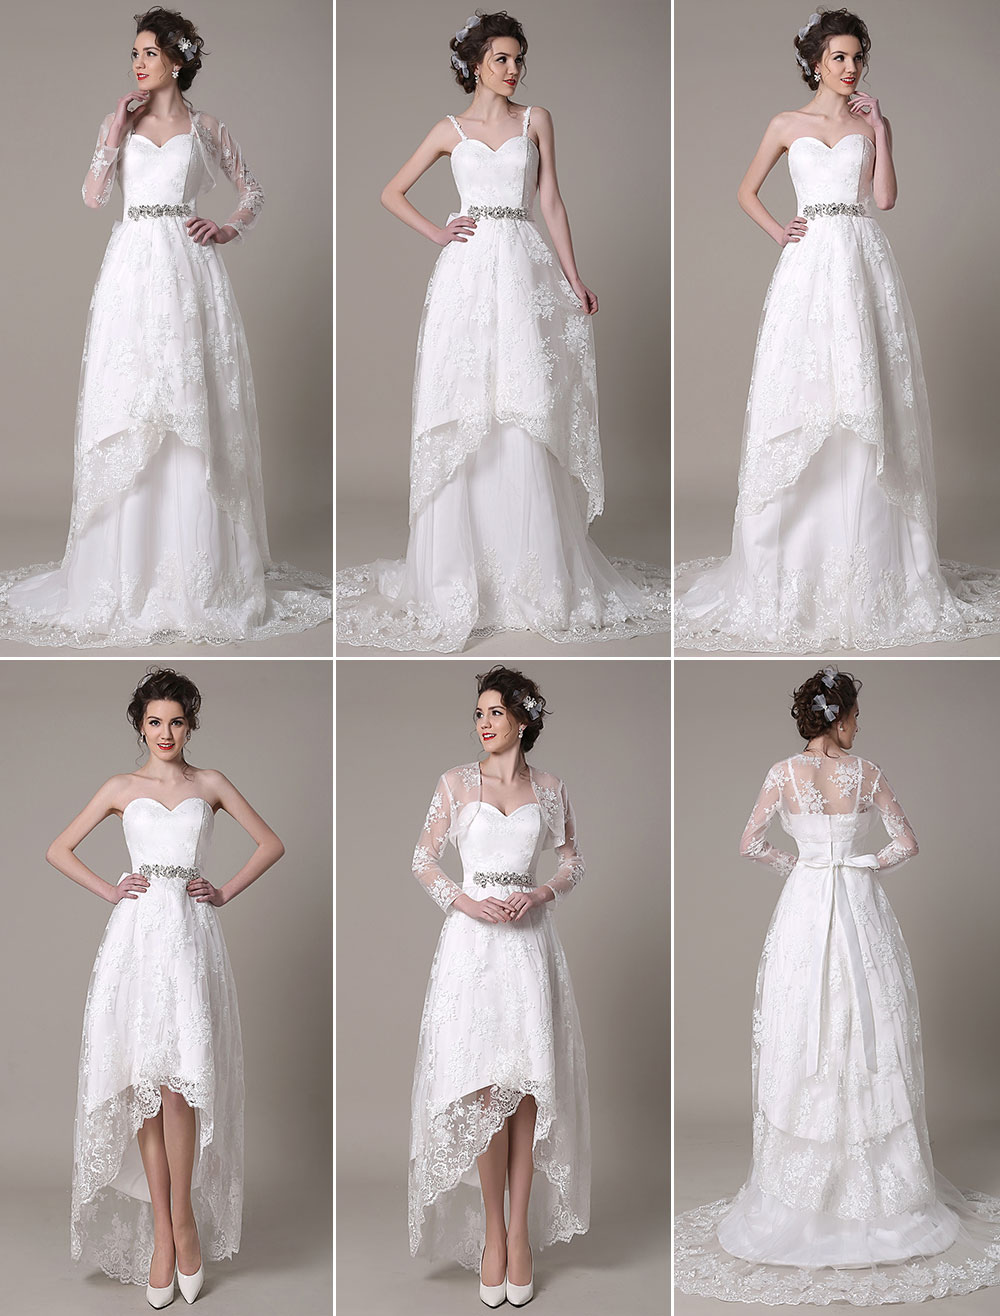 Detachable Wedding Dress.Detachable Wedding Dress Sweetheart A Line Rhinestone Sash Court Train Bridal Dress With Bow Milanoo